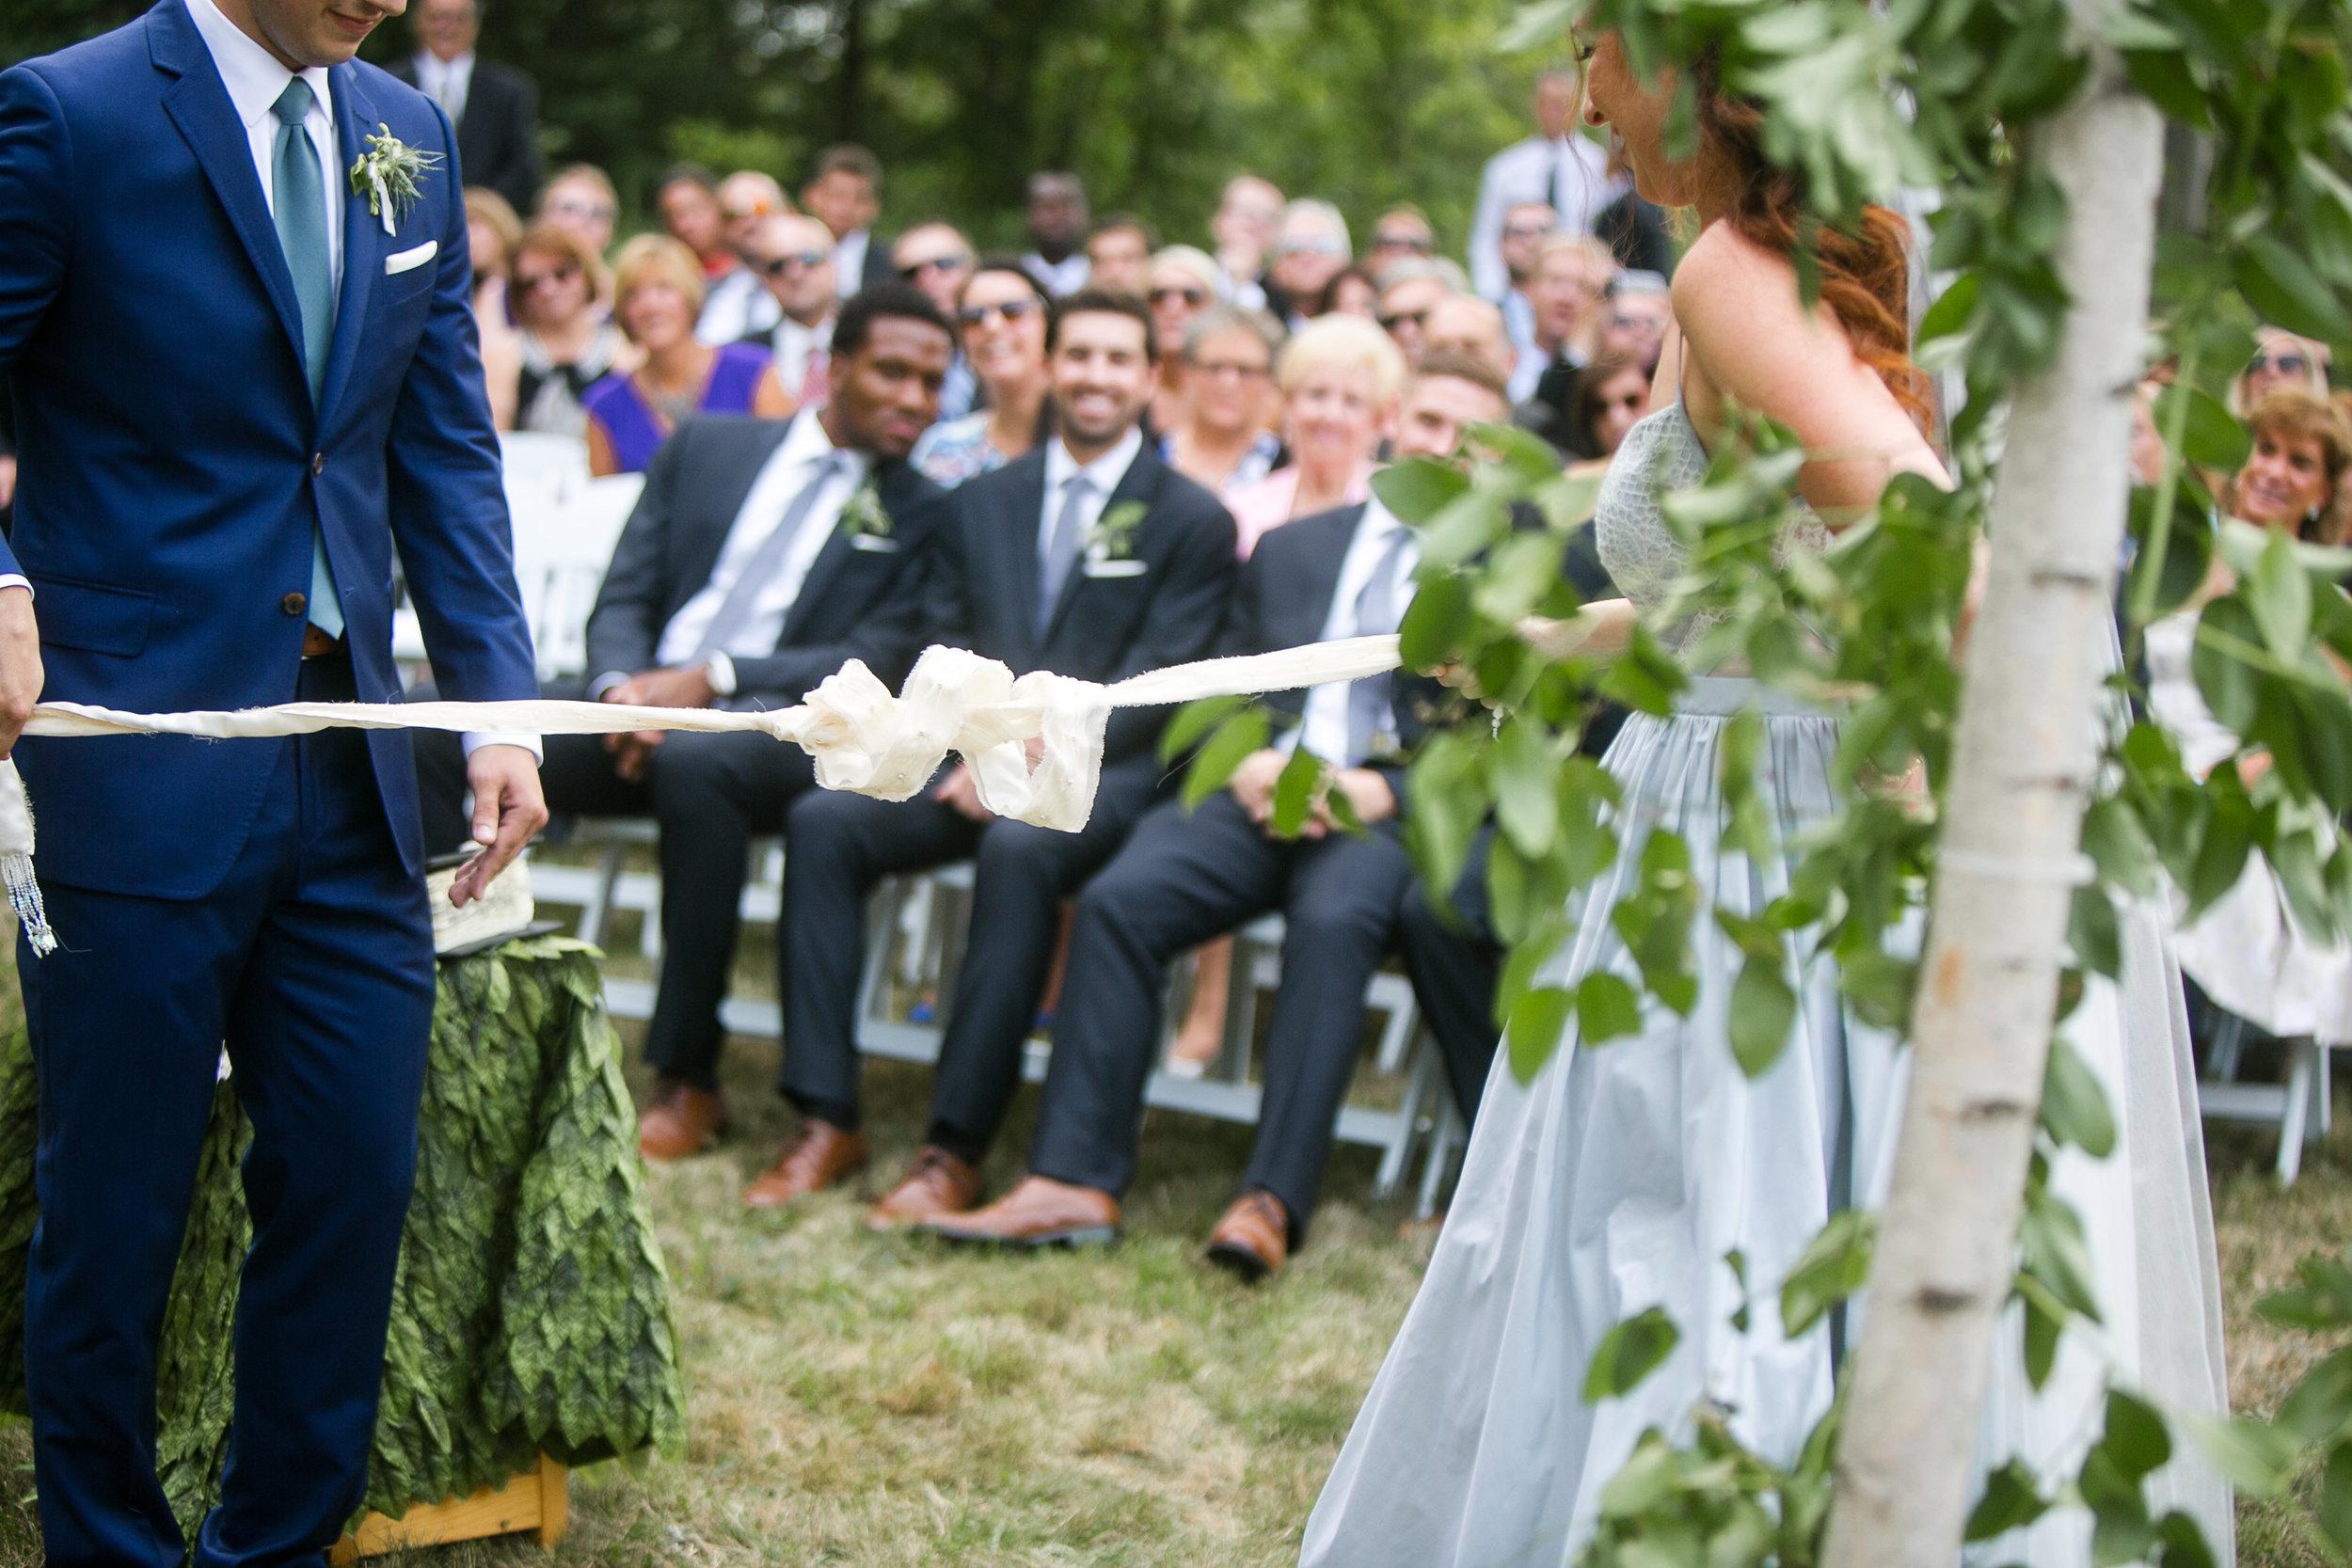 COPPER GEOMETRIC WEDDING LACE FACTORY WEDDING_012.jpg